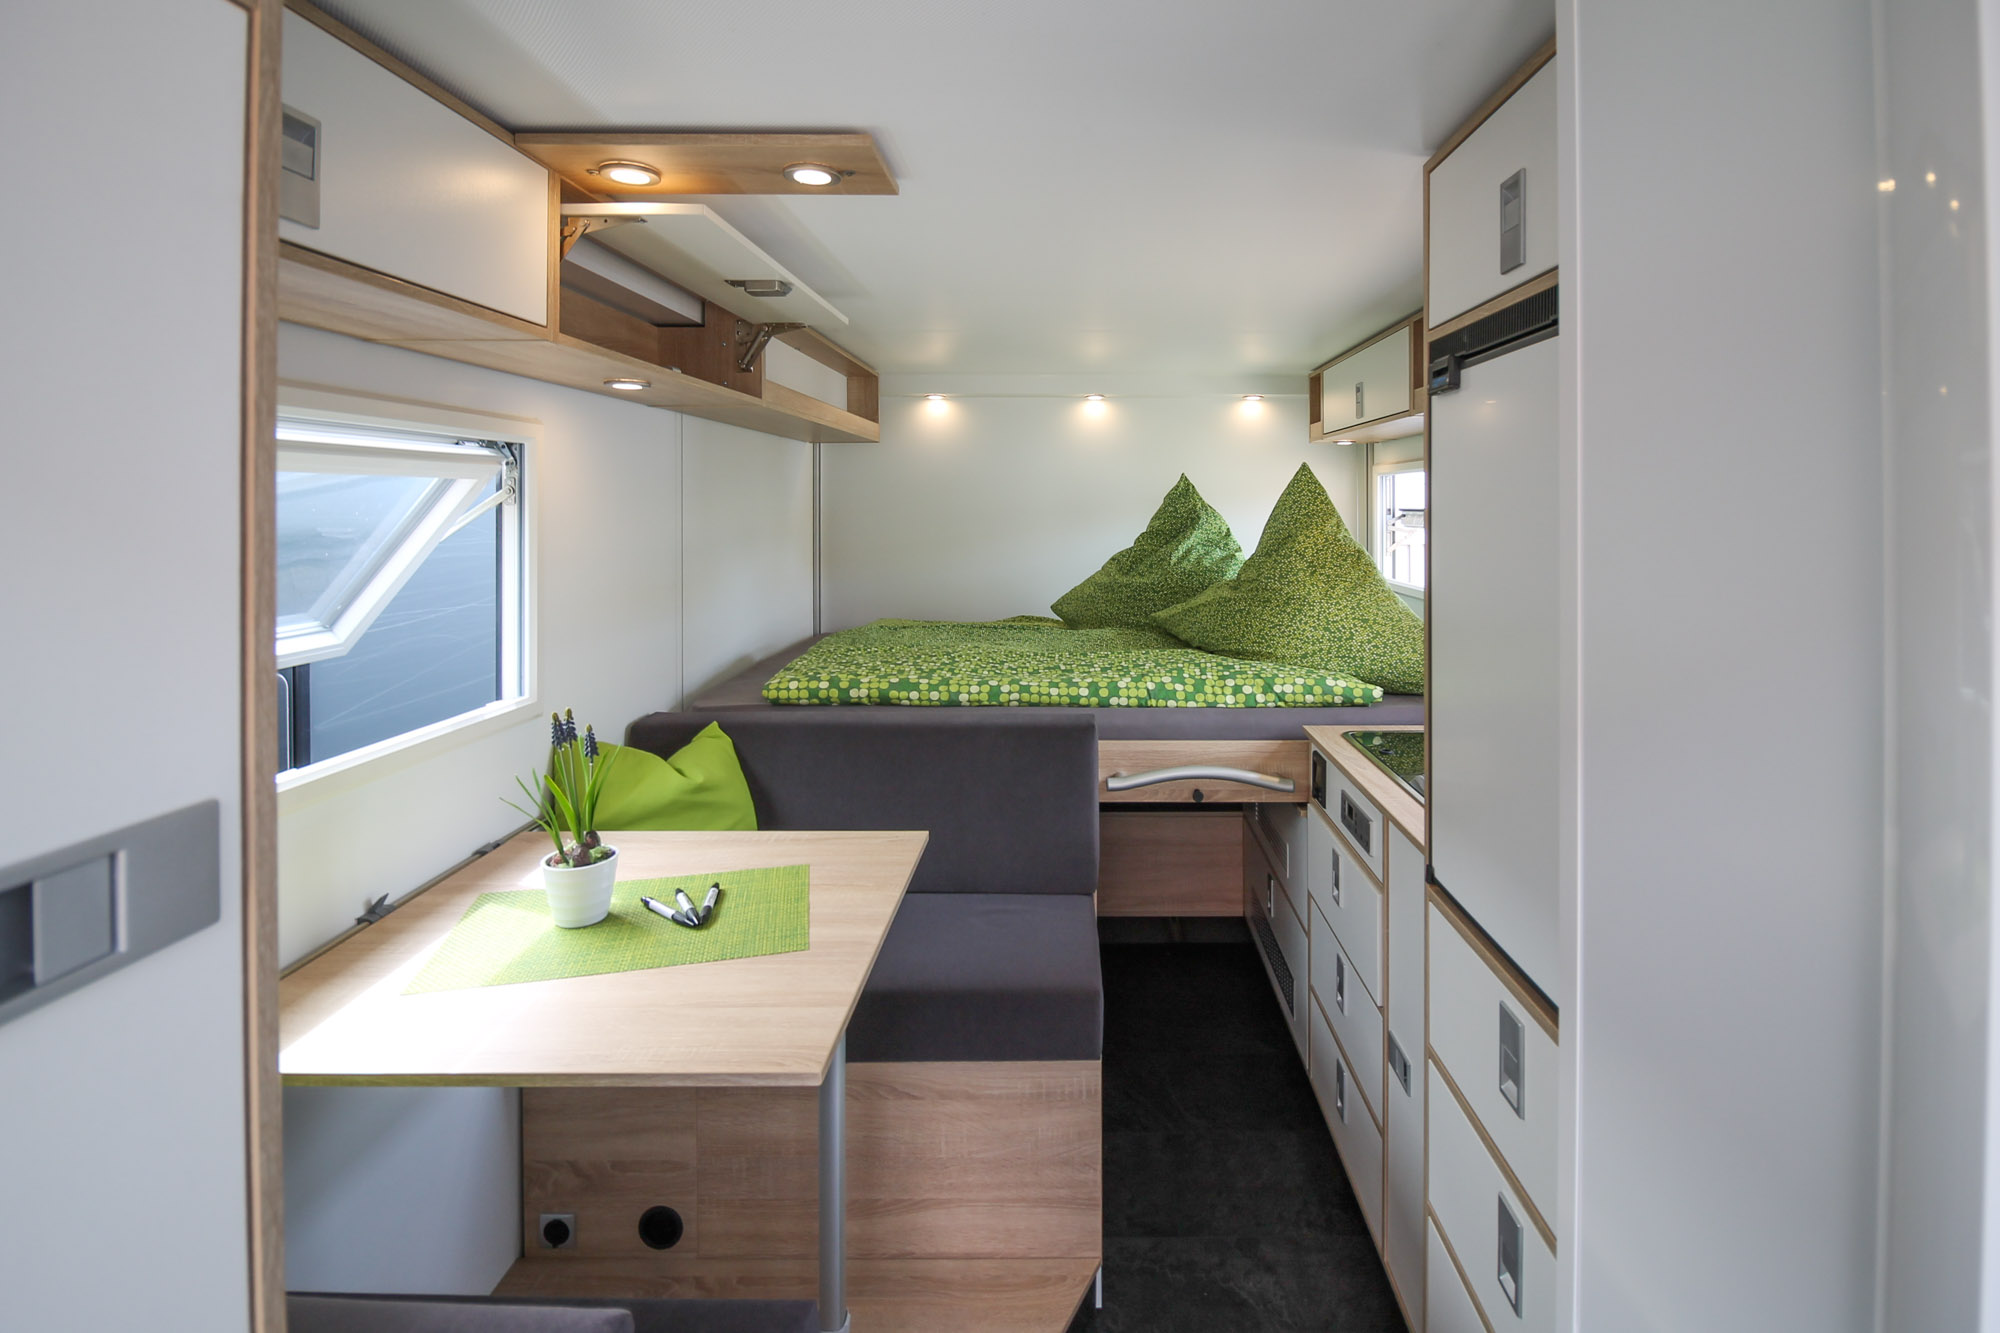 Zepbox Zeppelin Shelter Möbel